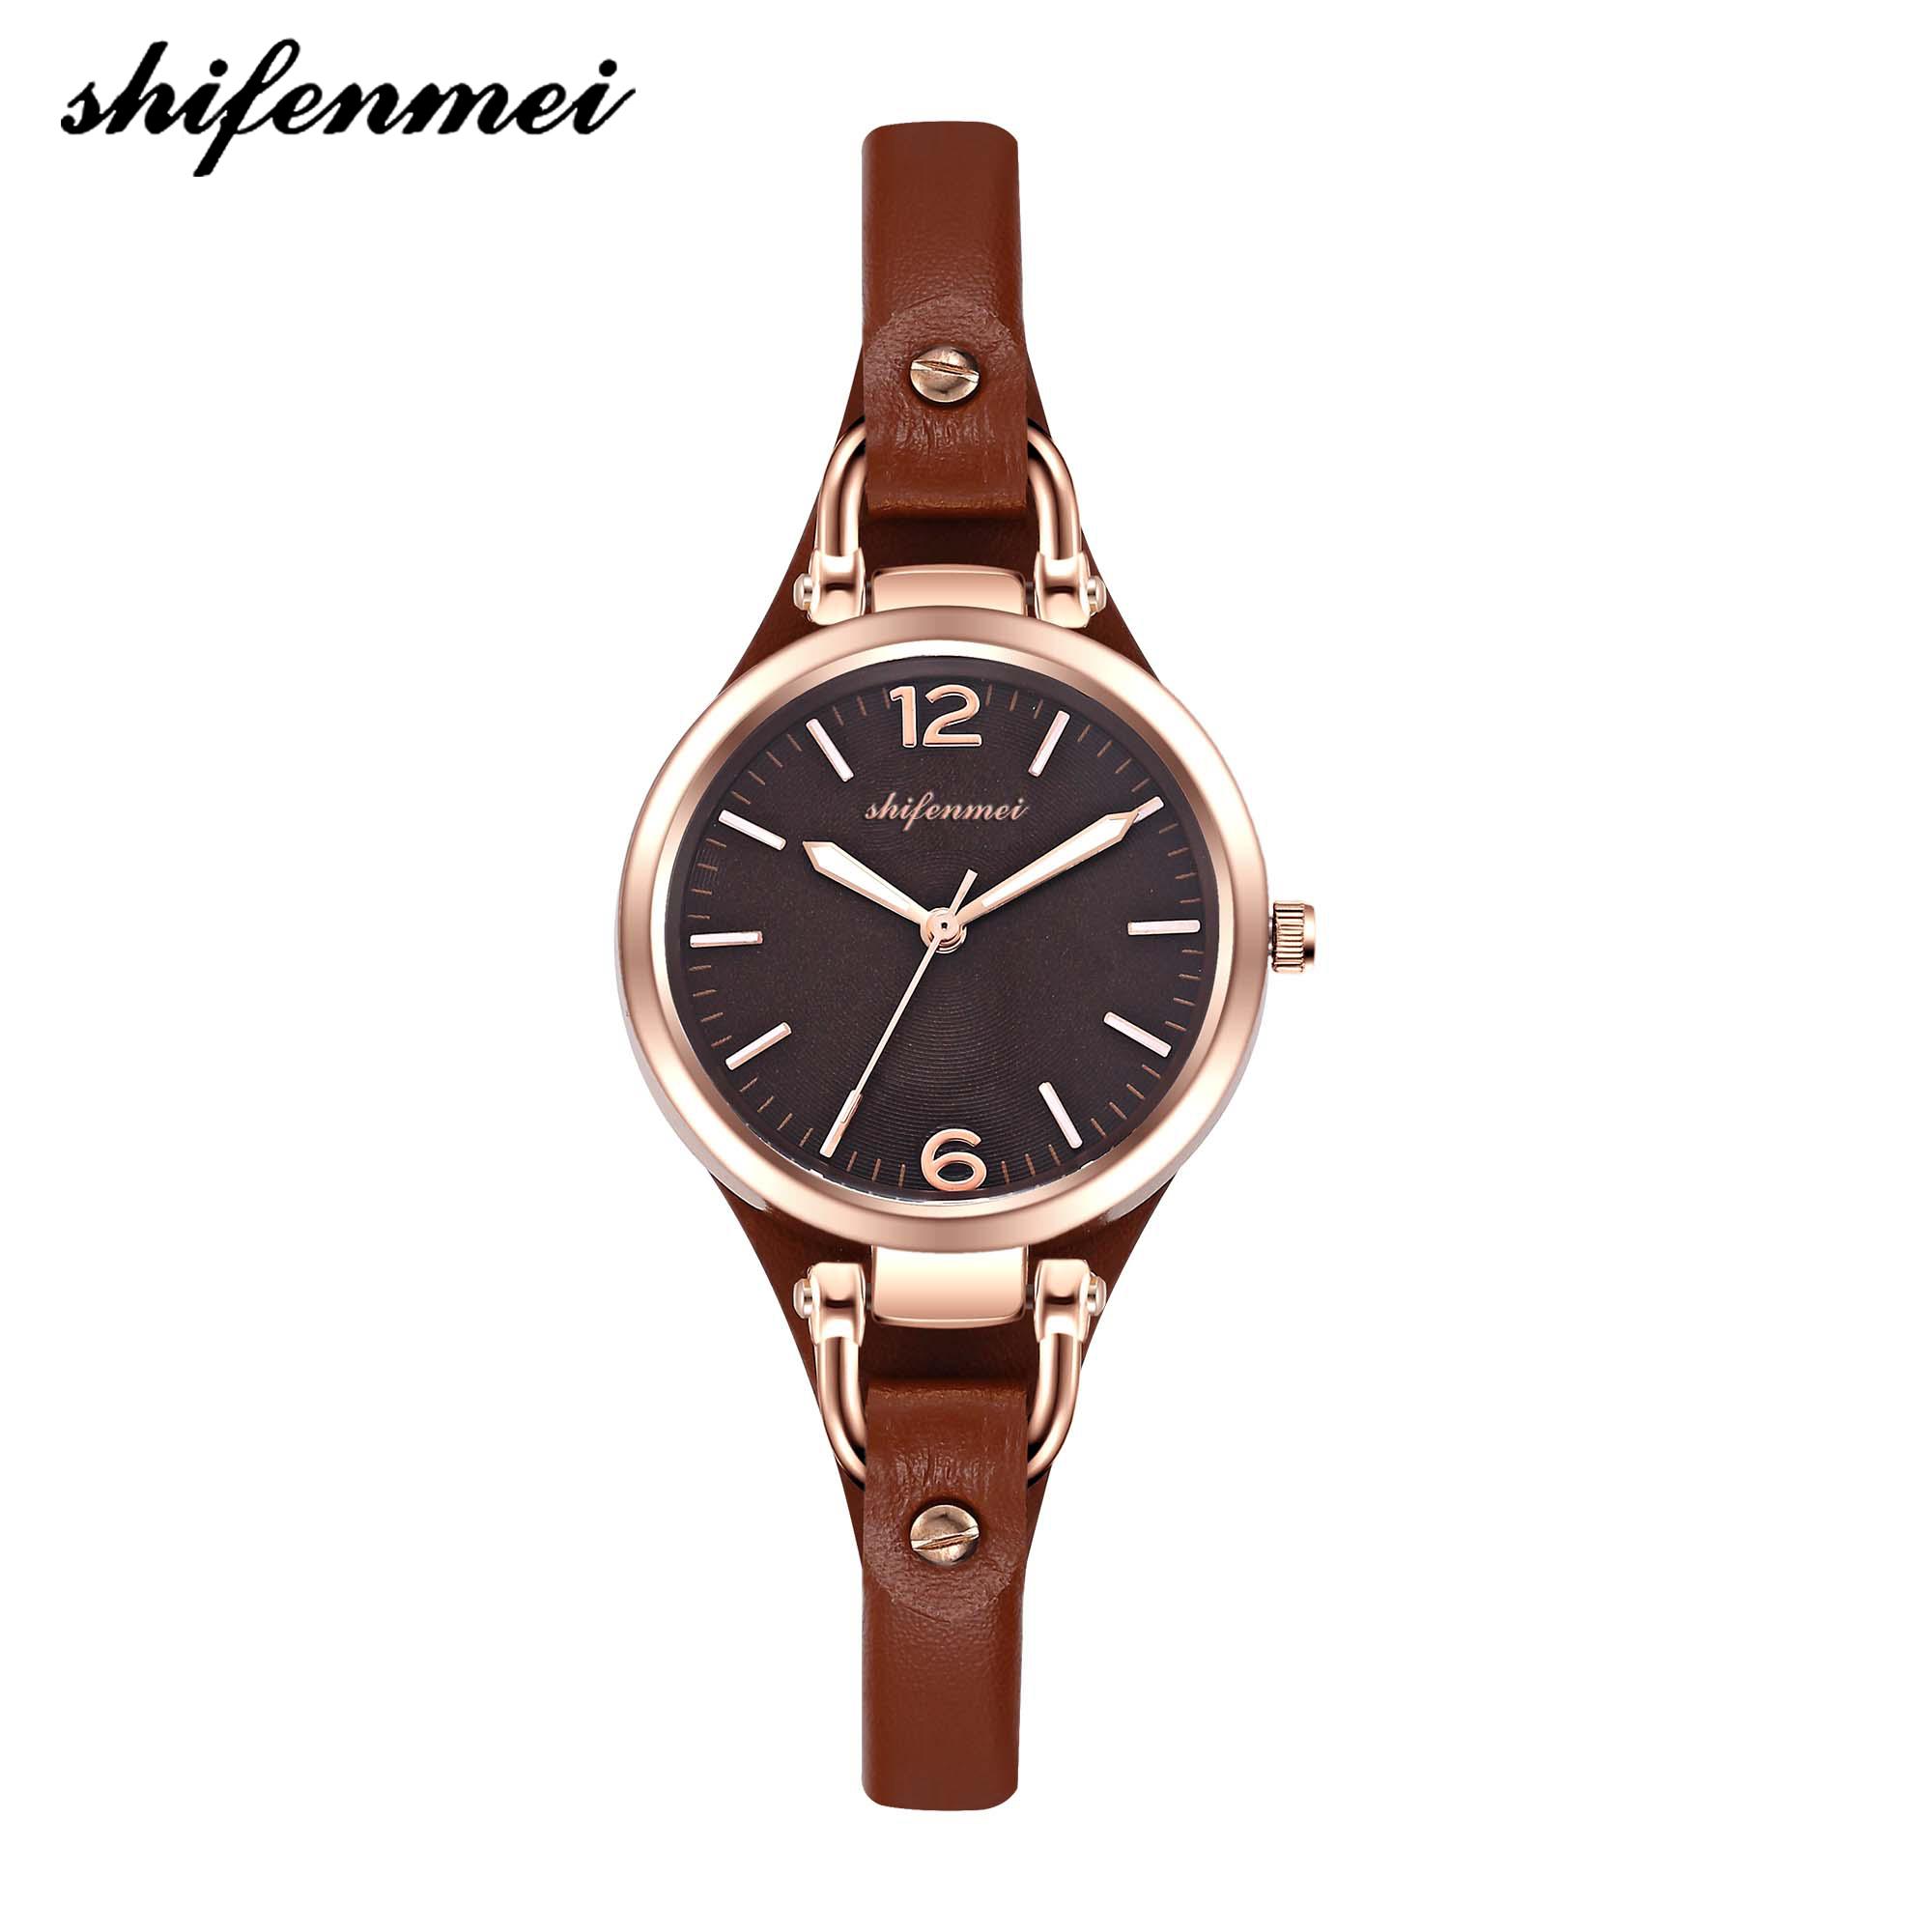 Luxury quartz classic Lovers watch fashion casual watches waterproof leather belt for women wristwatch фото